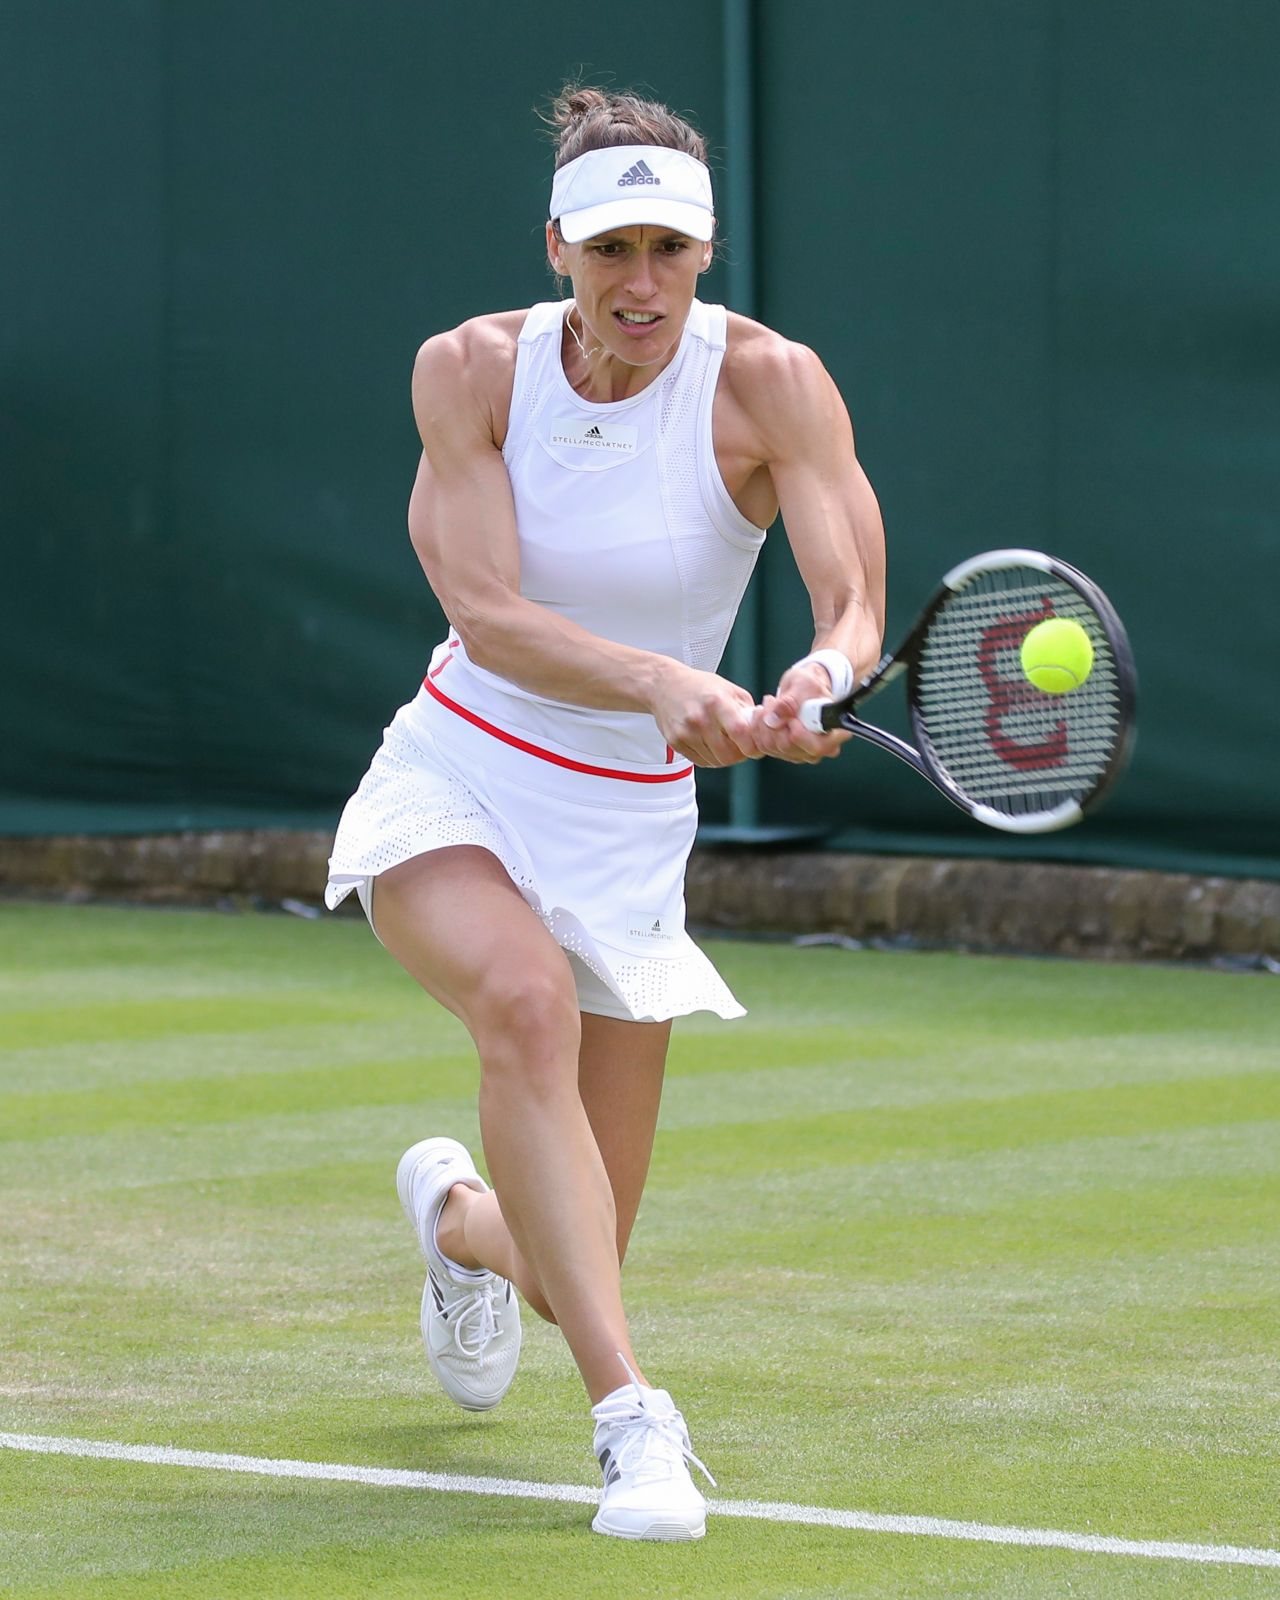 Andrea Petkovic – Wimbledon Tennis Championships 07/02/2019